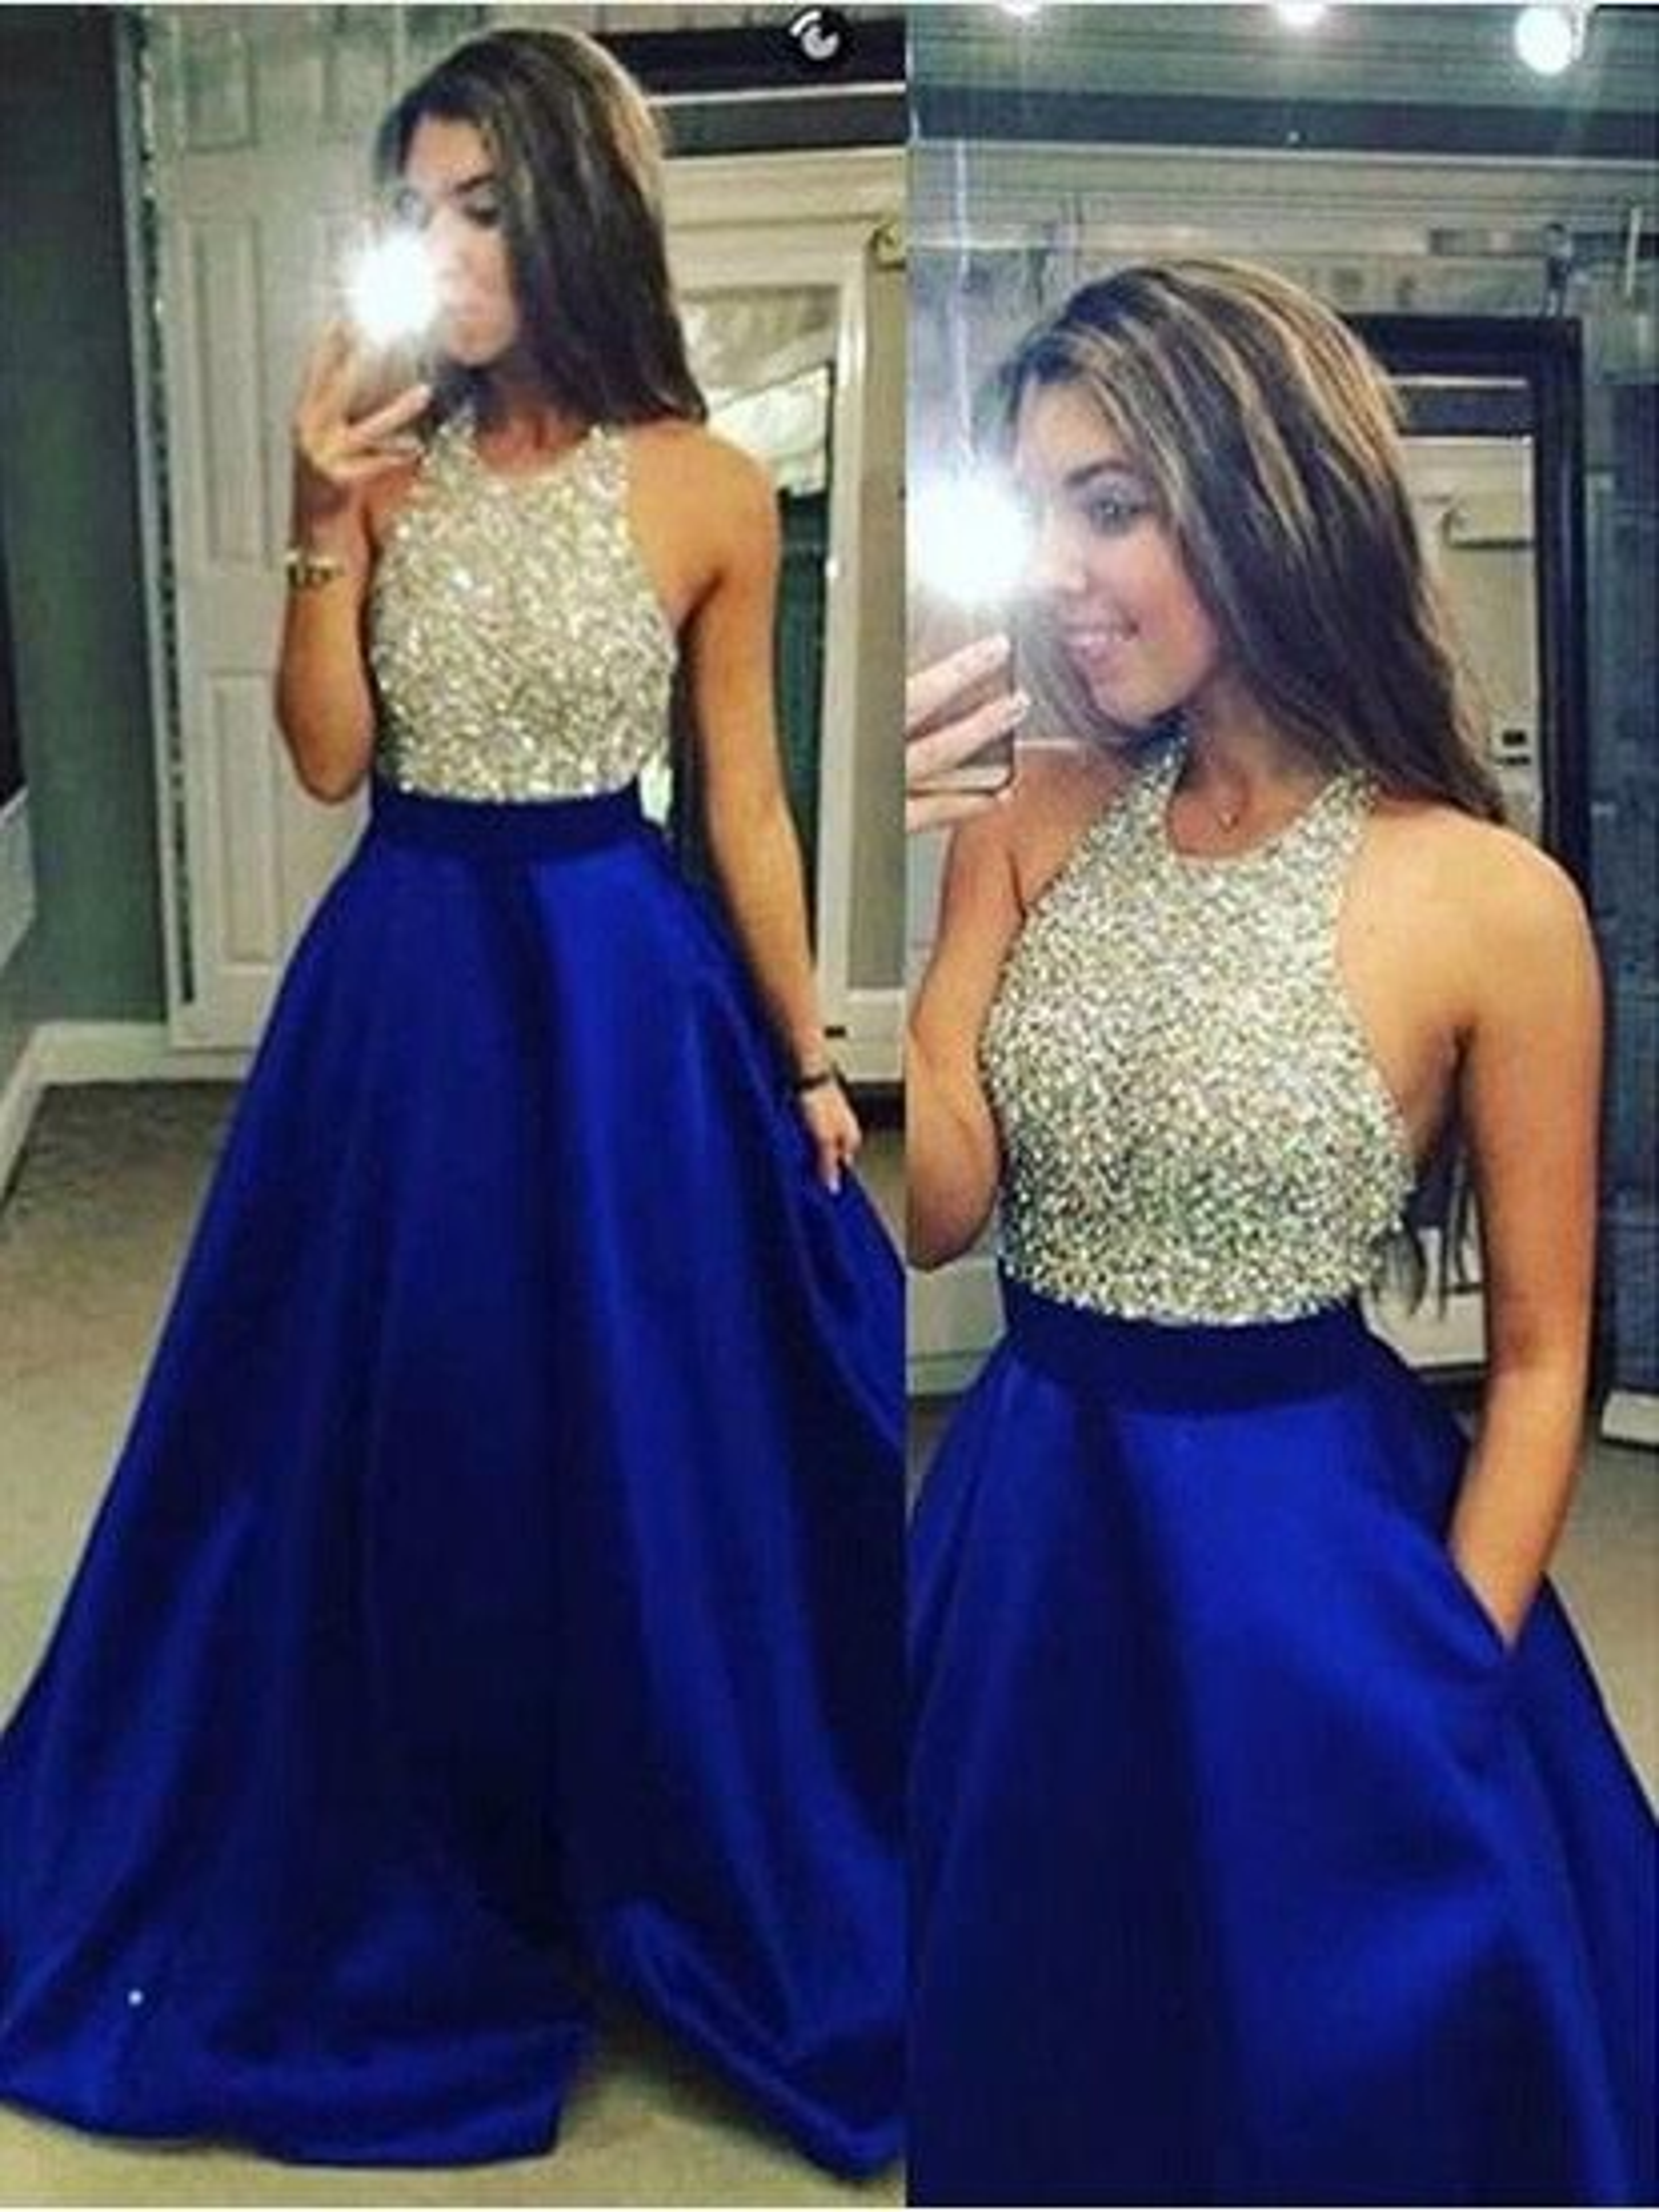 2cfa6207 Ball Gown Sleeveless Jewel Crystal Satin Floor-Length Dresses - Hebeos